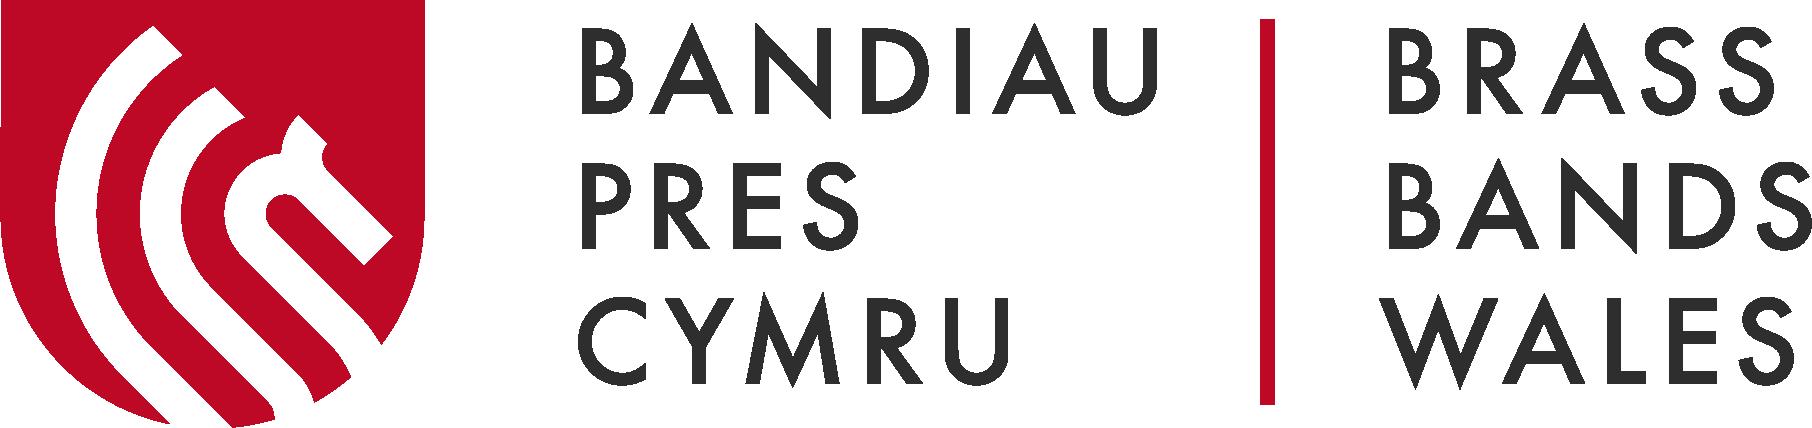 Bandiau Pres Cymru